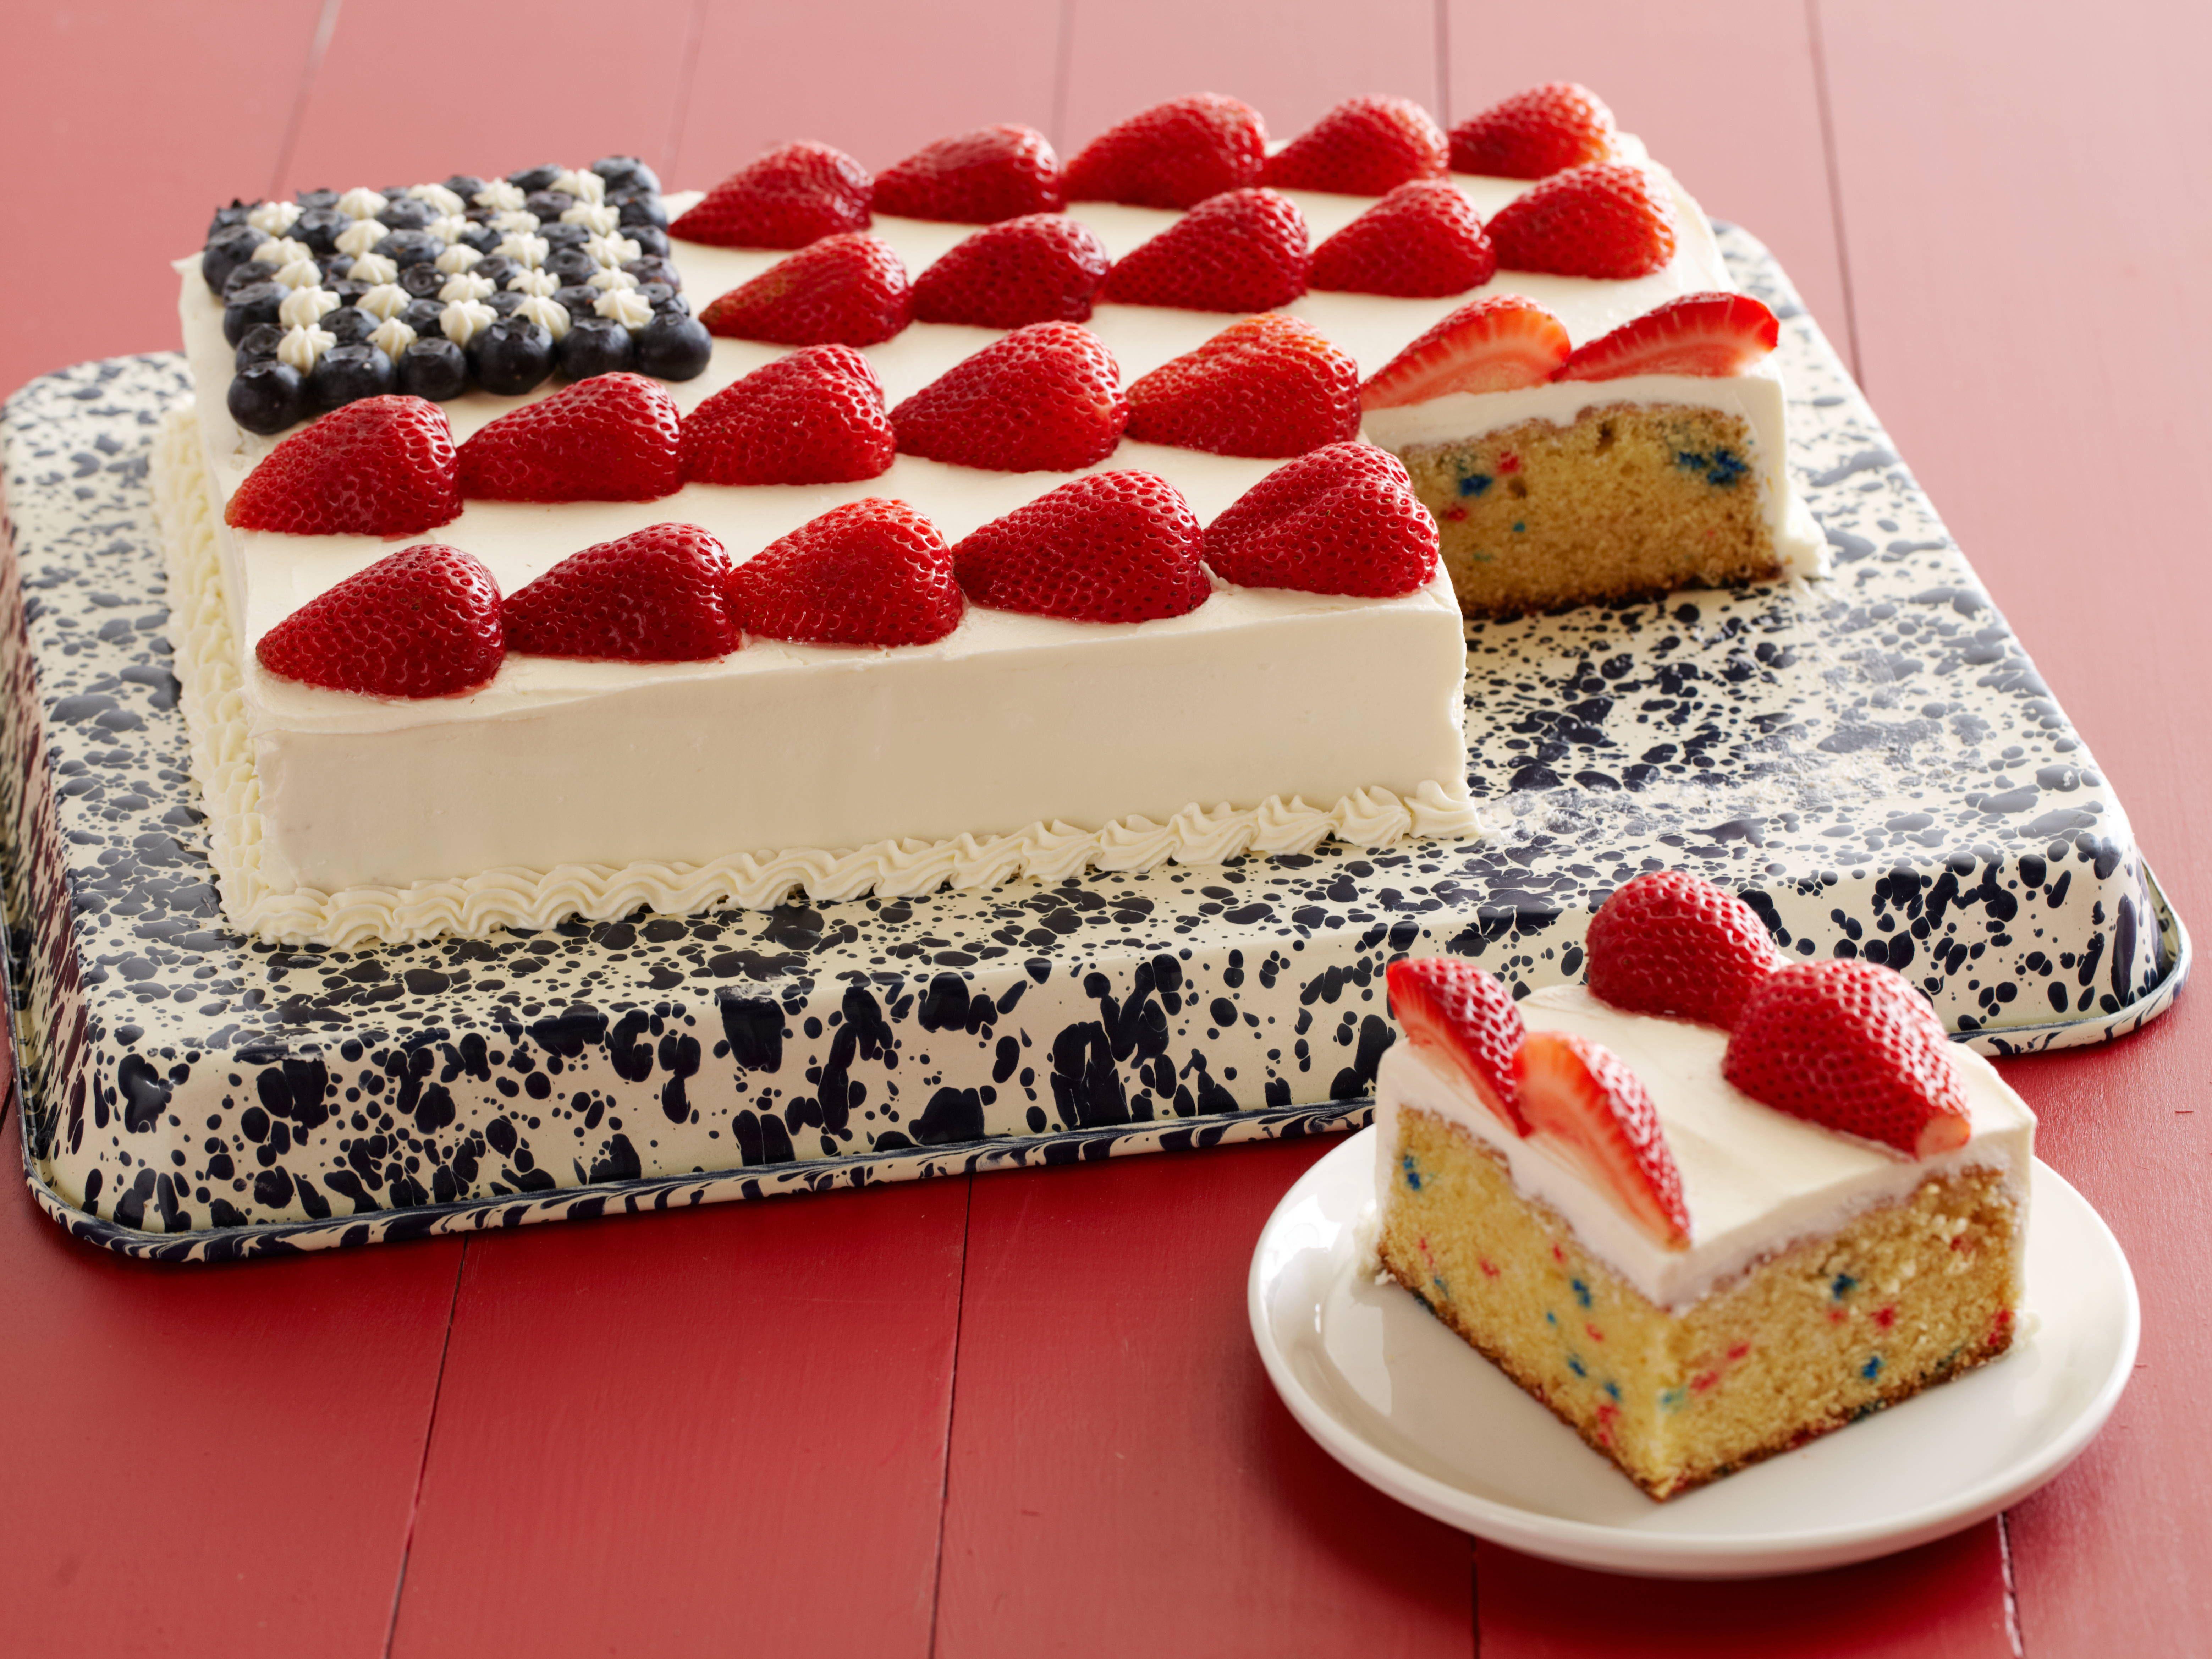 Flag Cake from FoodNetwork.com